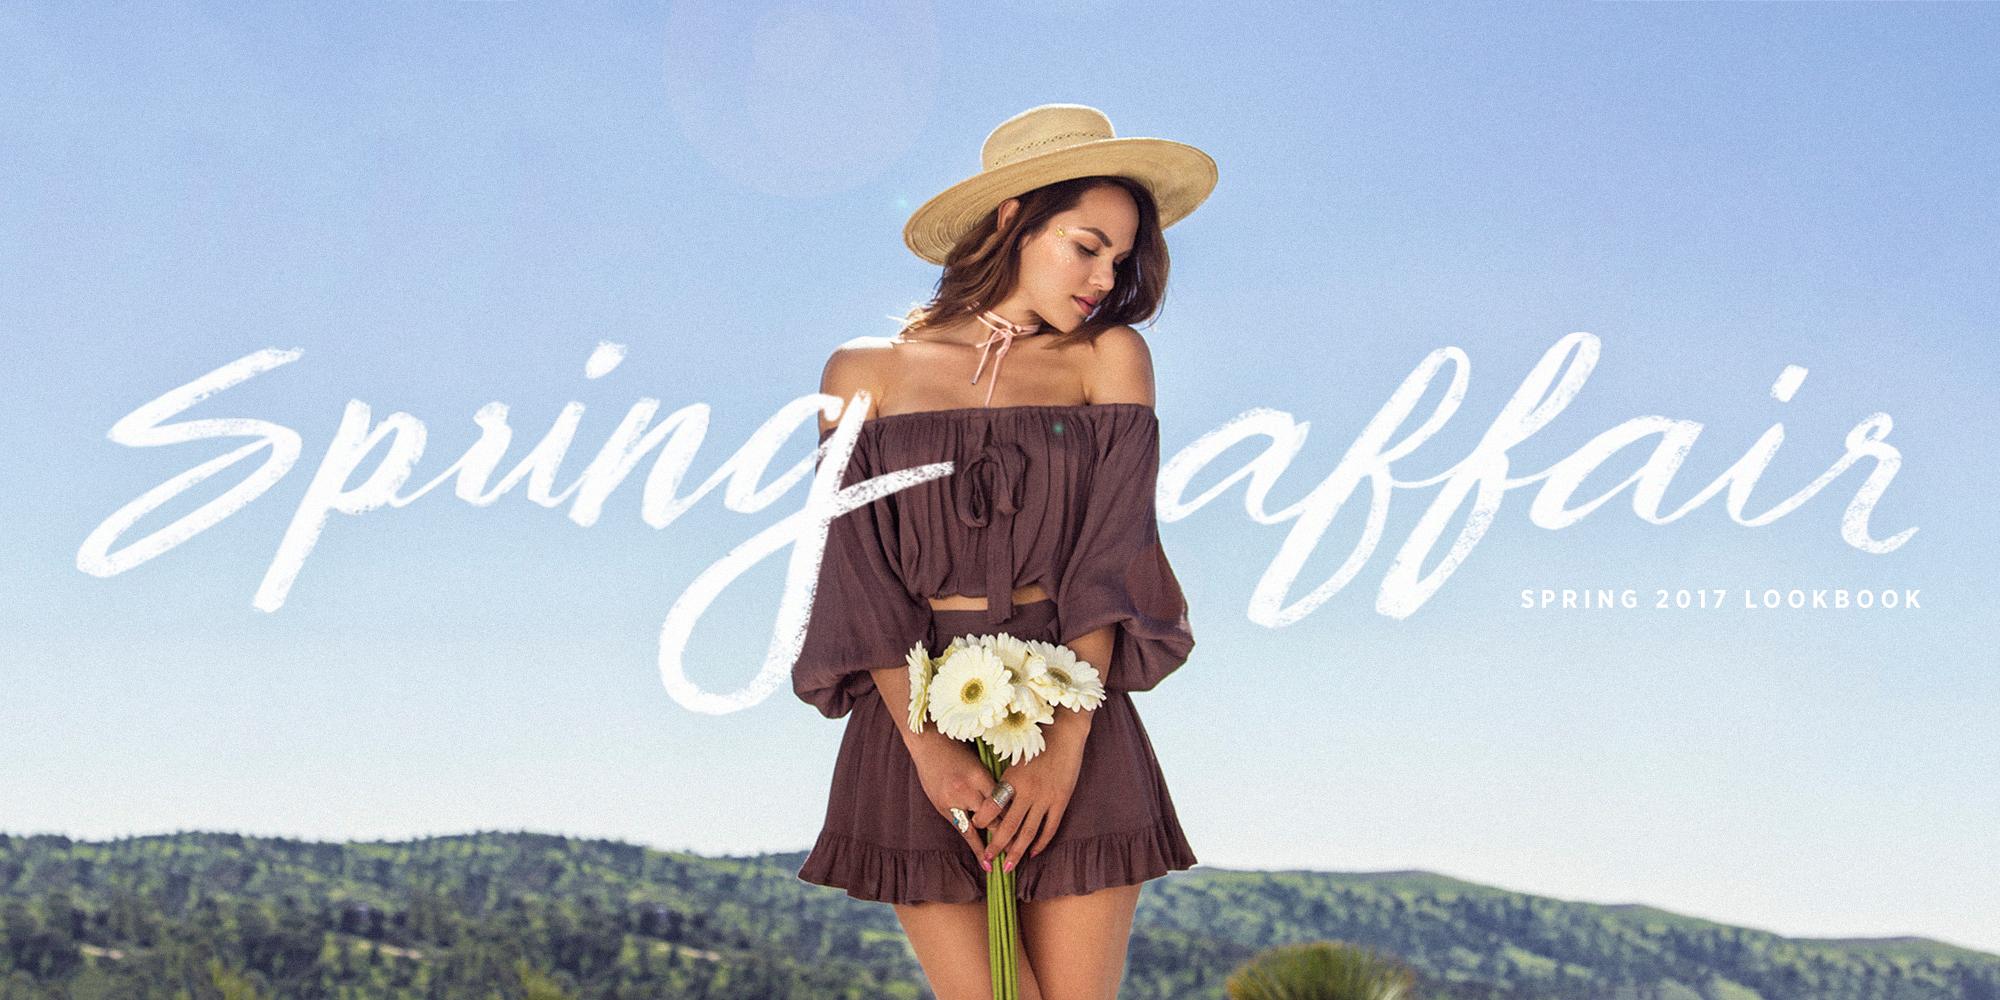 springaffair_lb_cover_2.jpg